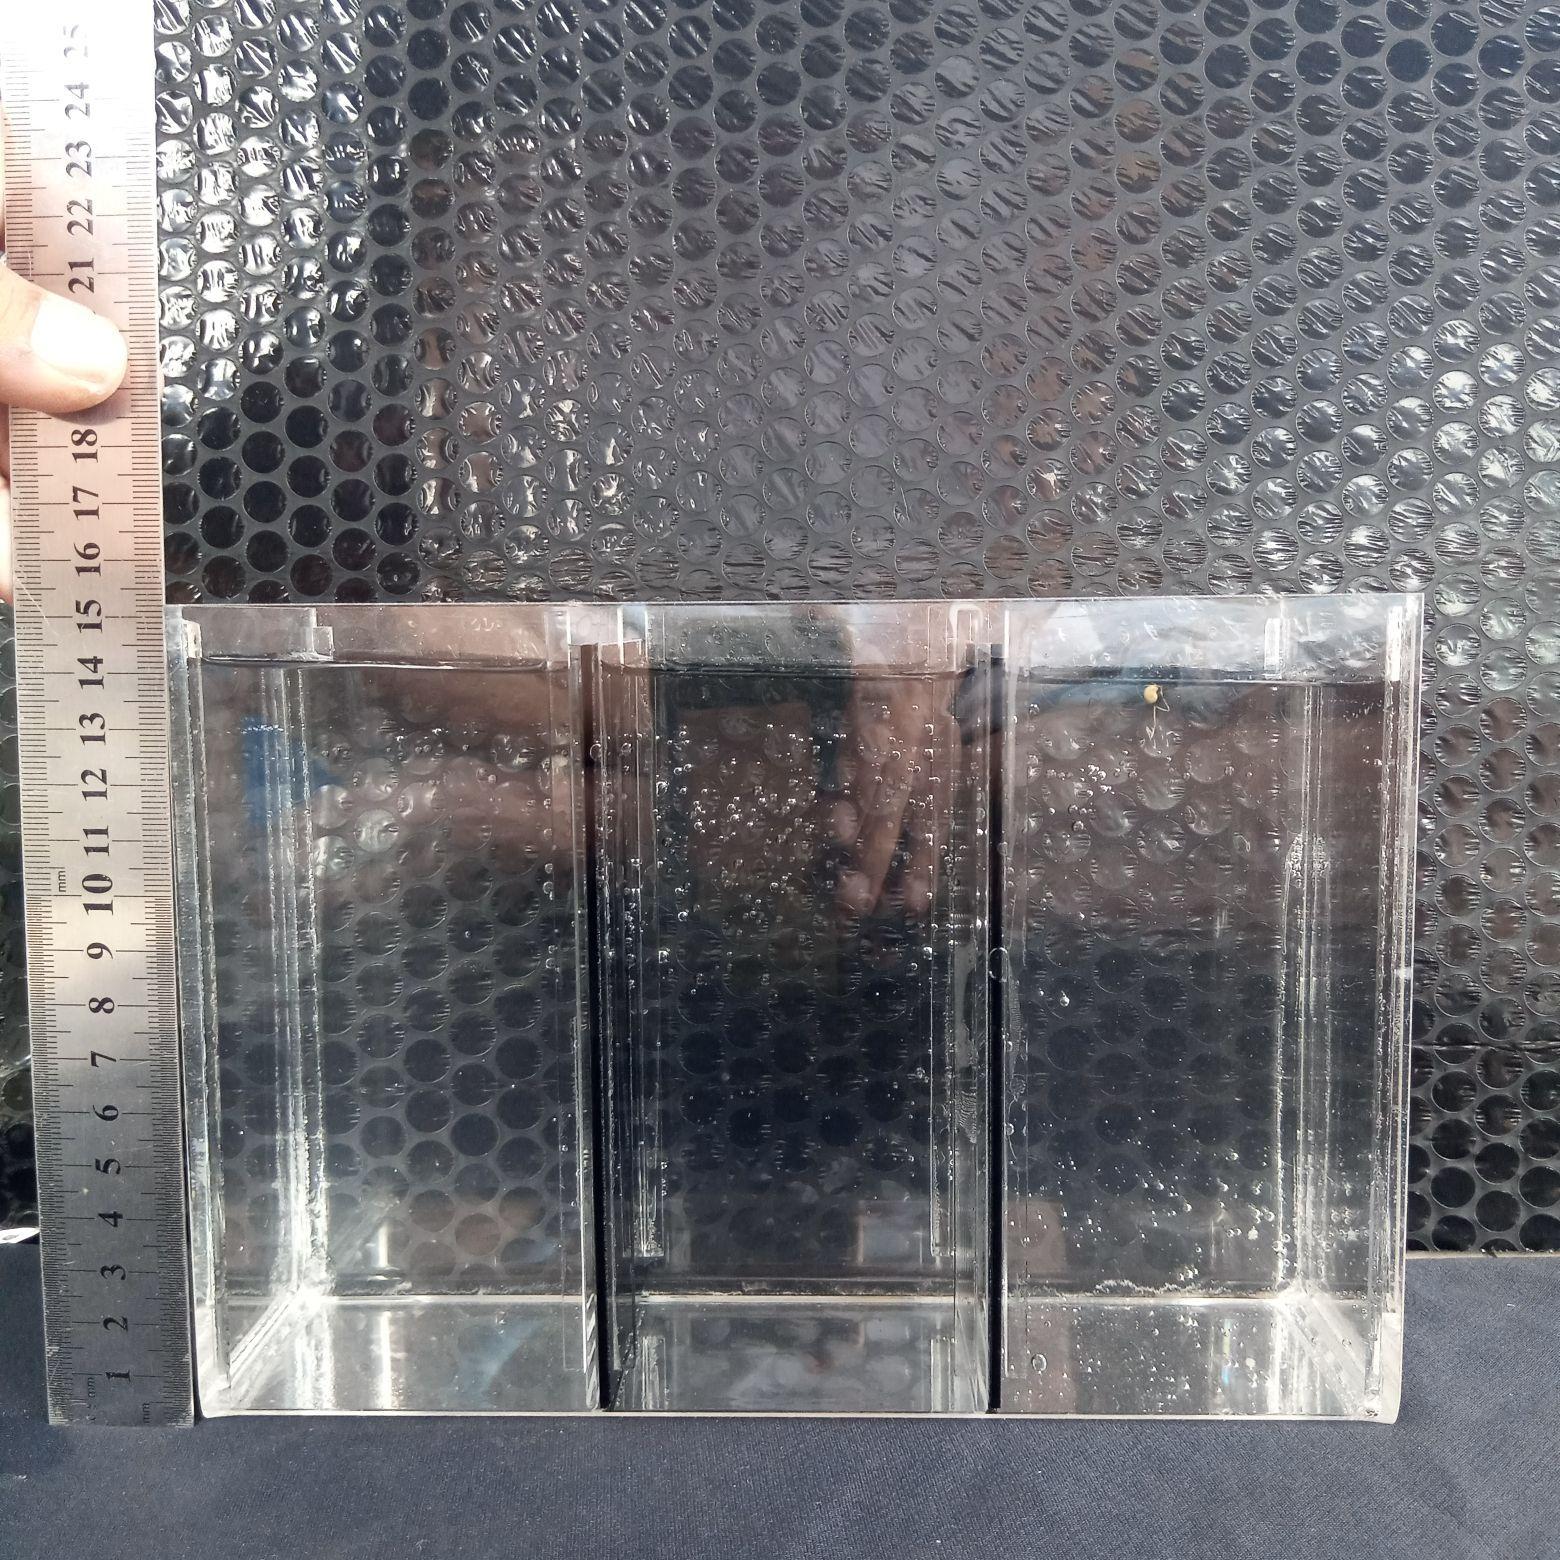 Aquarium Acrylic Ikan Cupang 3 Ruang Sekat Buka Tutup Ukuran 22x8x15 Cm Tebal 2 Mm Lazada Indonesia